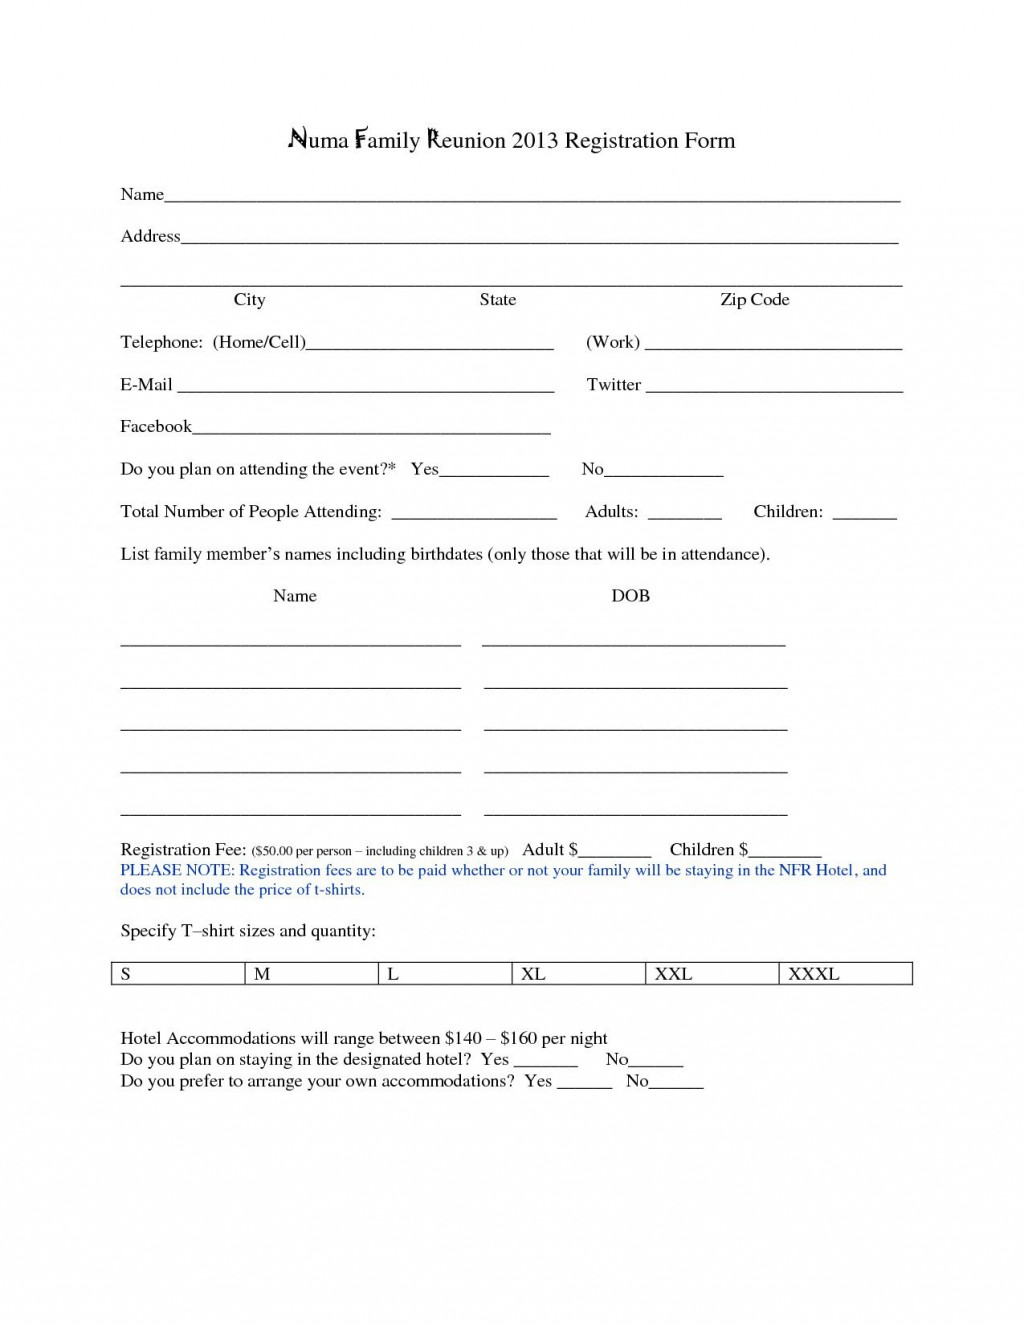 000 Wonderful Registration Form Template Word High Def  Conference FreeLarge